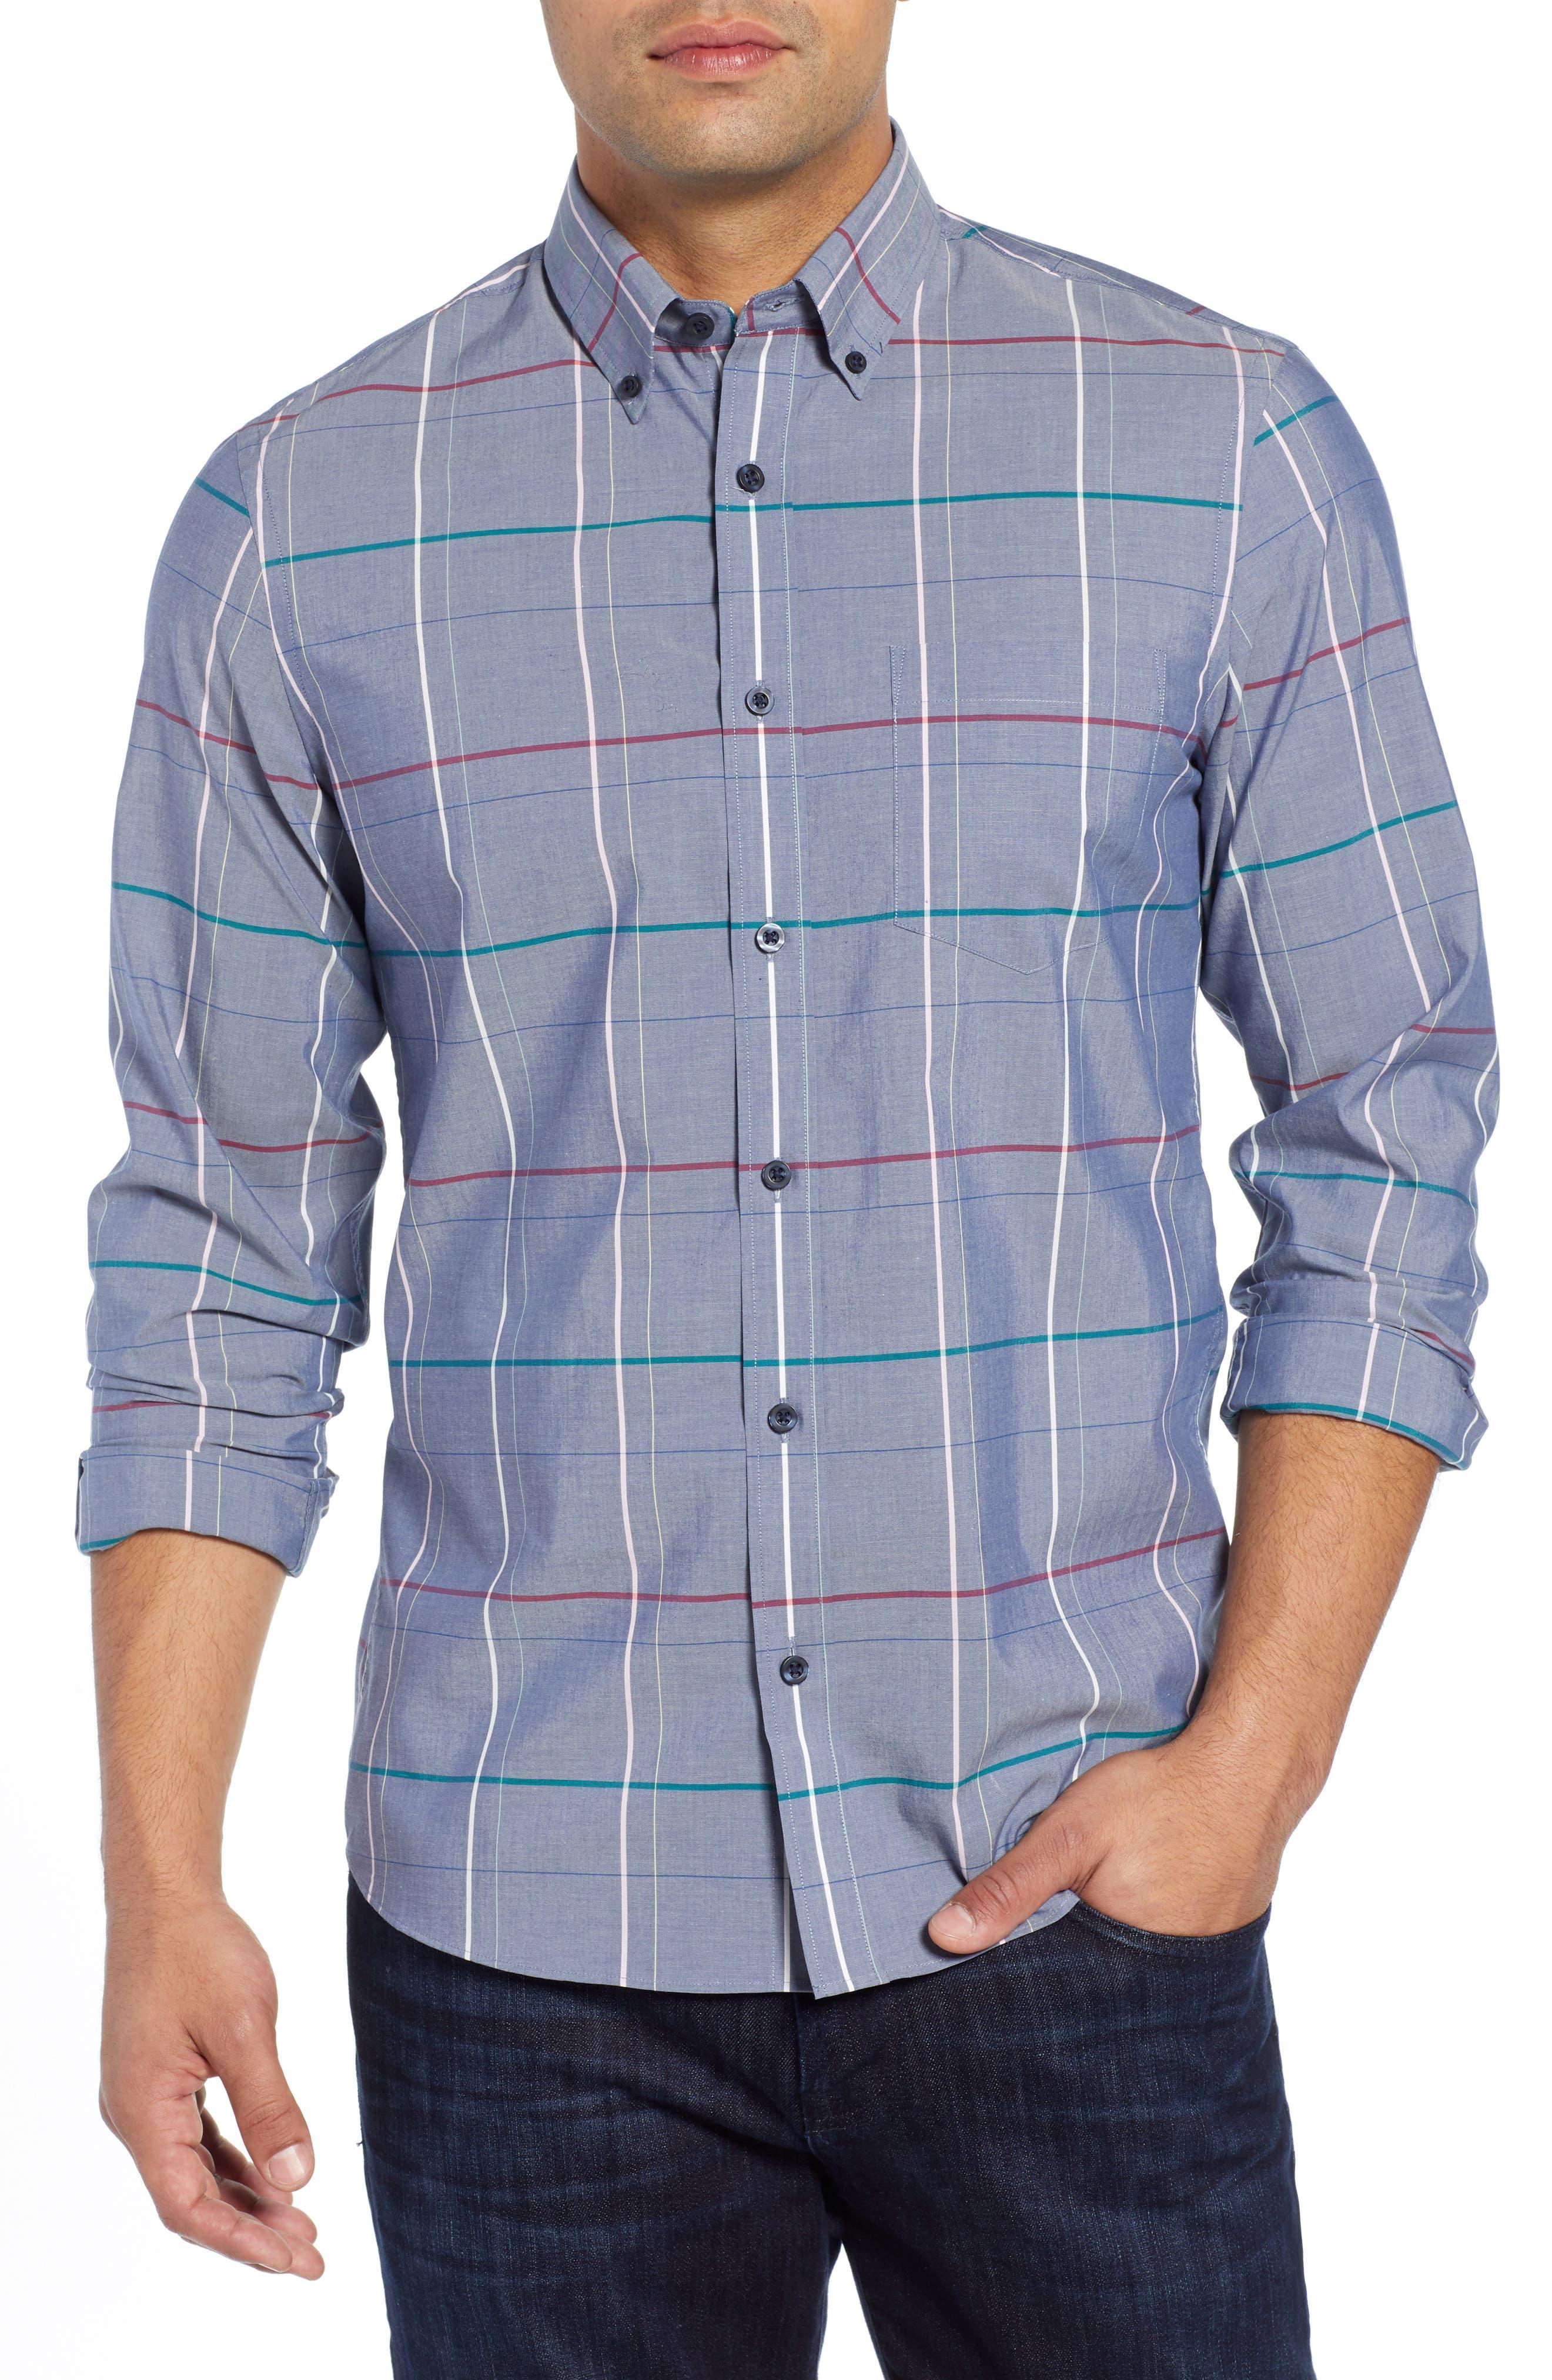 Nordstrom Shop Tech-Smart Slim Fit Multi Pane Sport Shirt, Grey